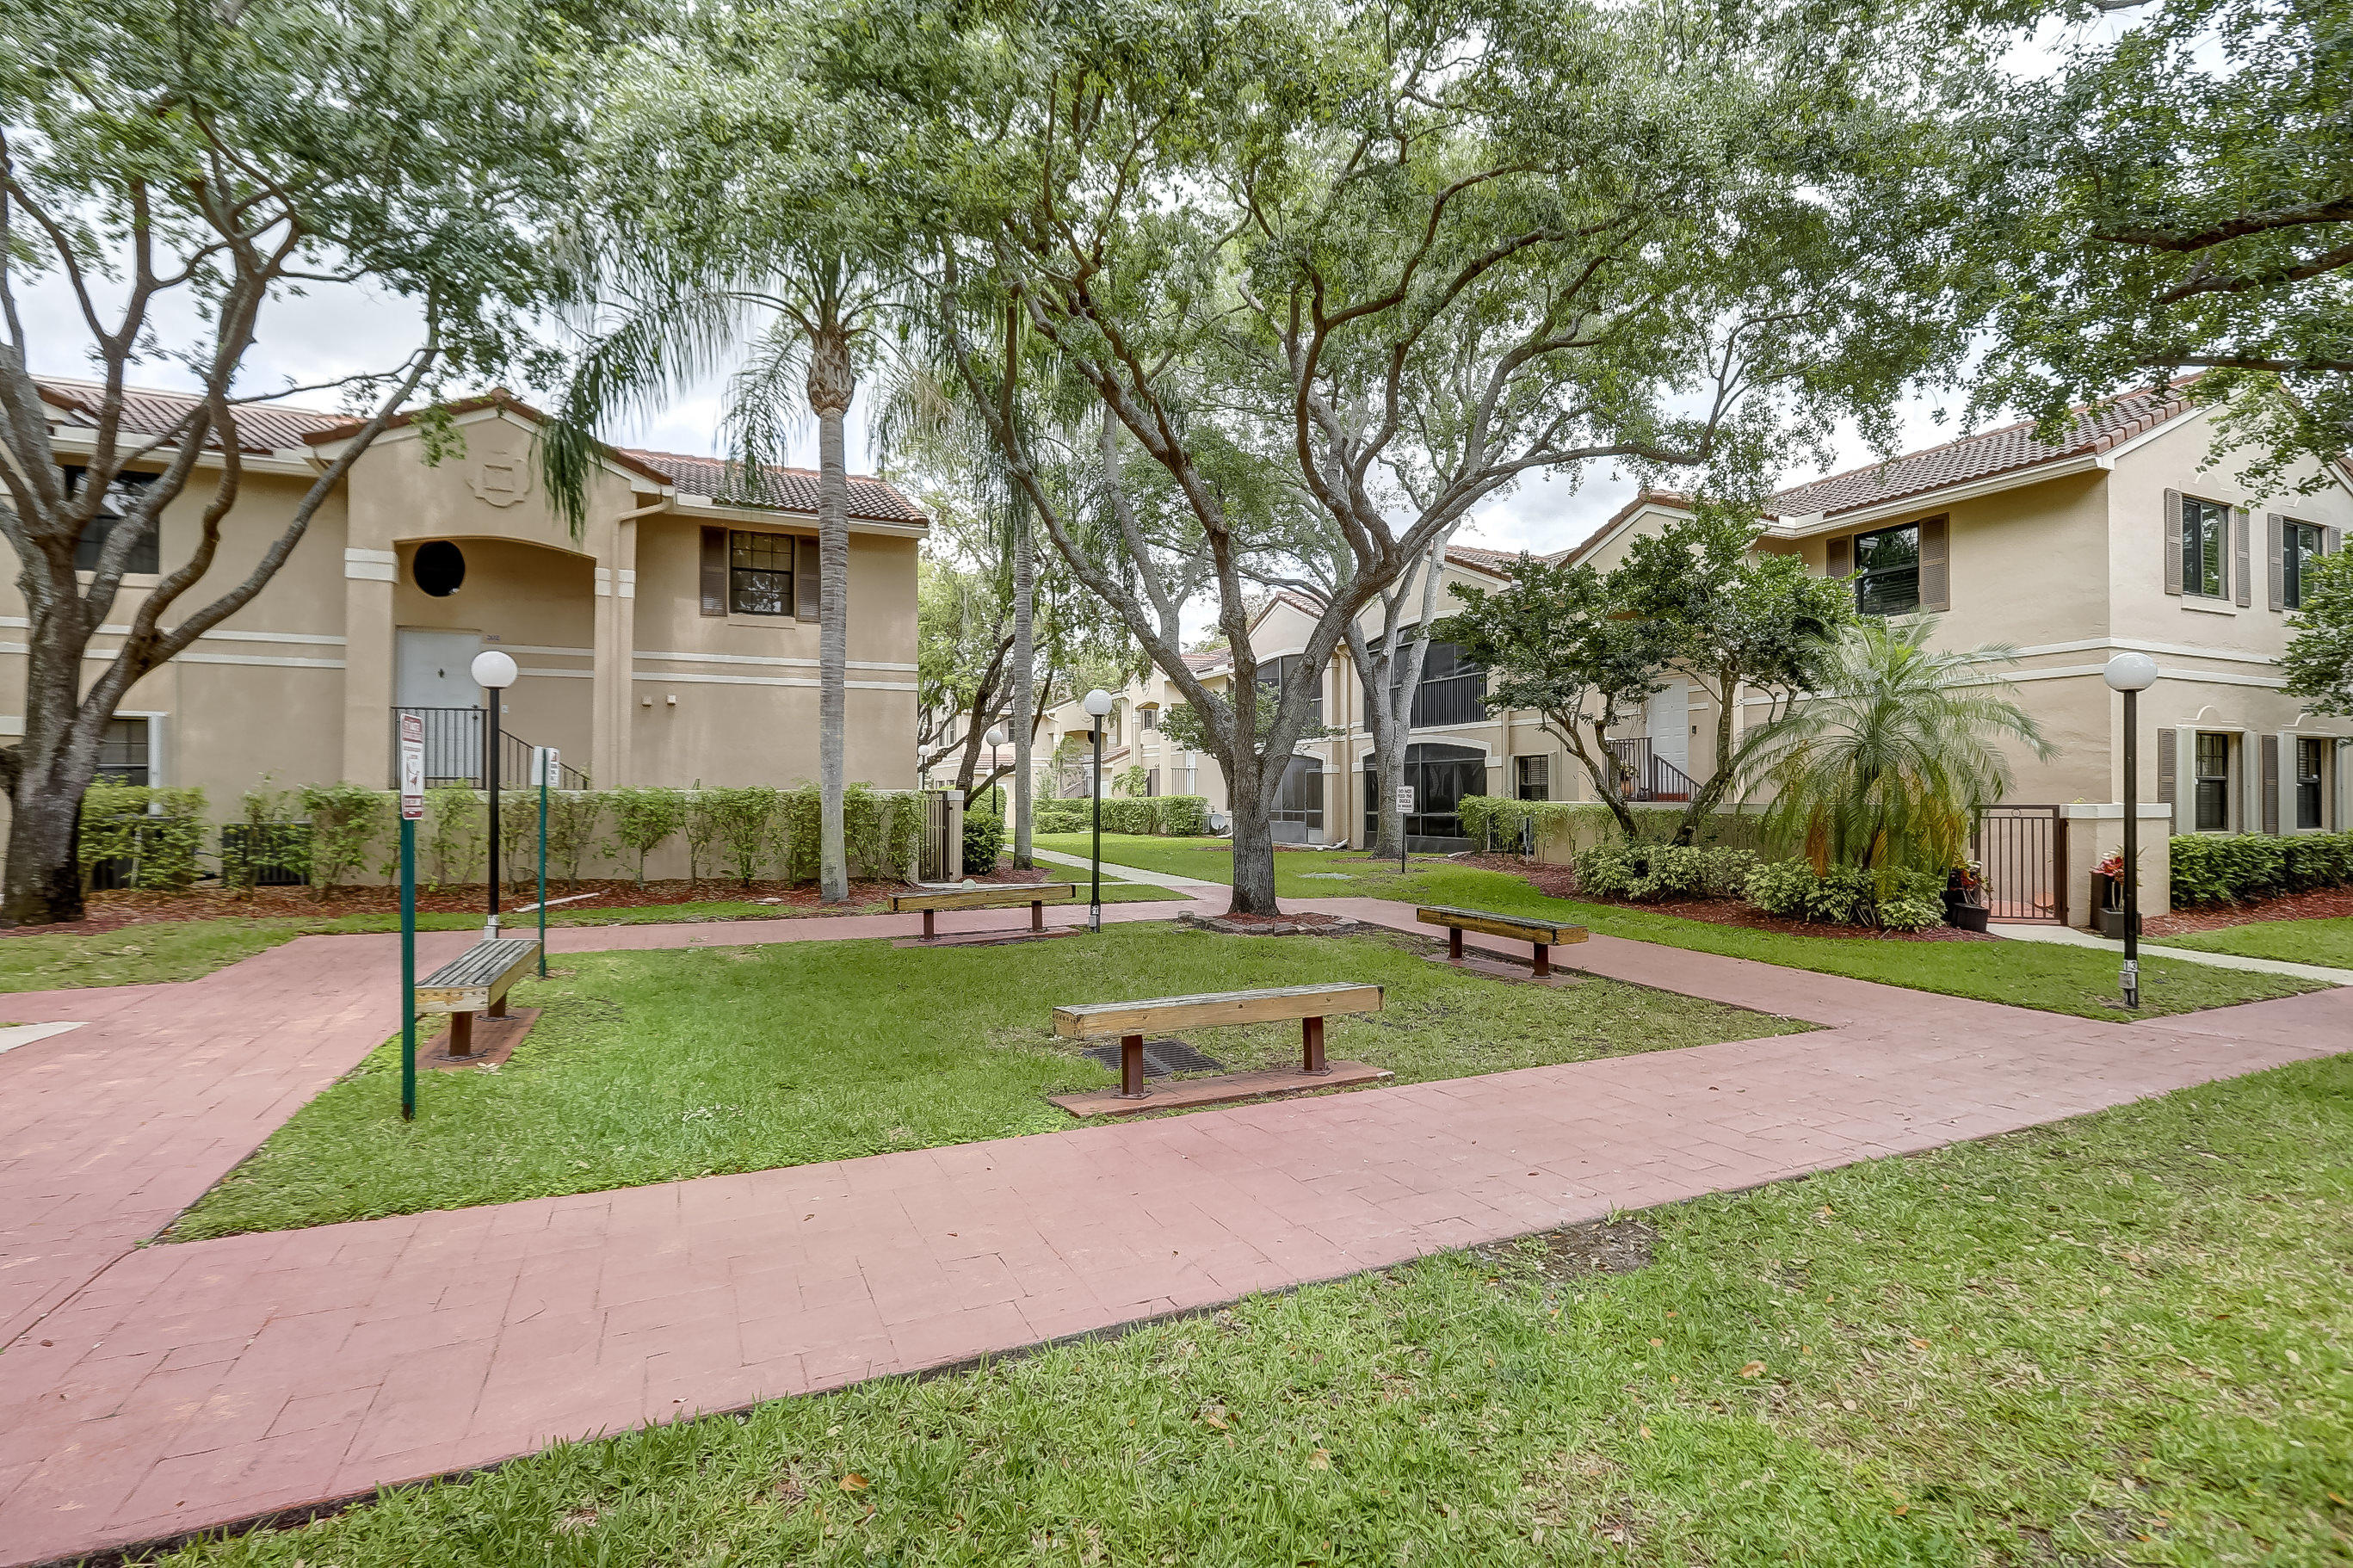 402 SW 158th Terrace 204 Pembroke Pines, FL 33027 photo 52